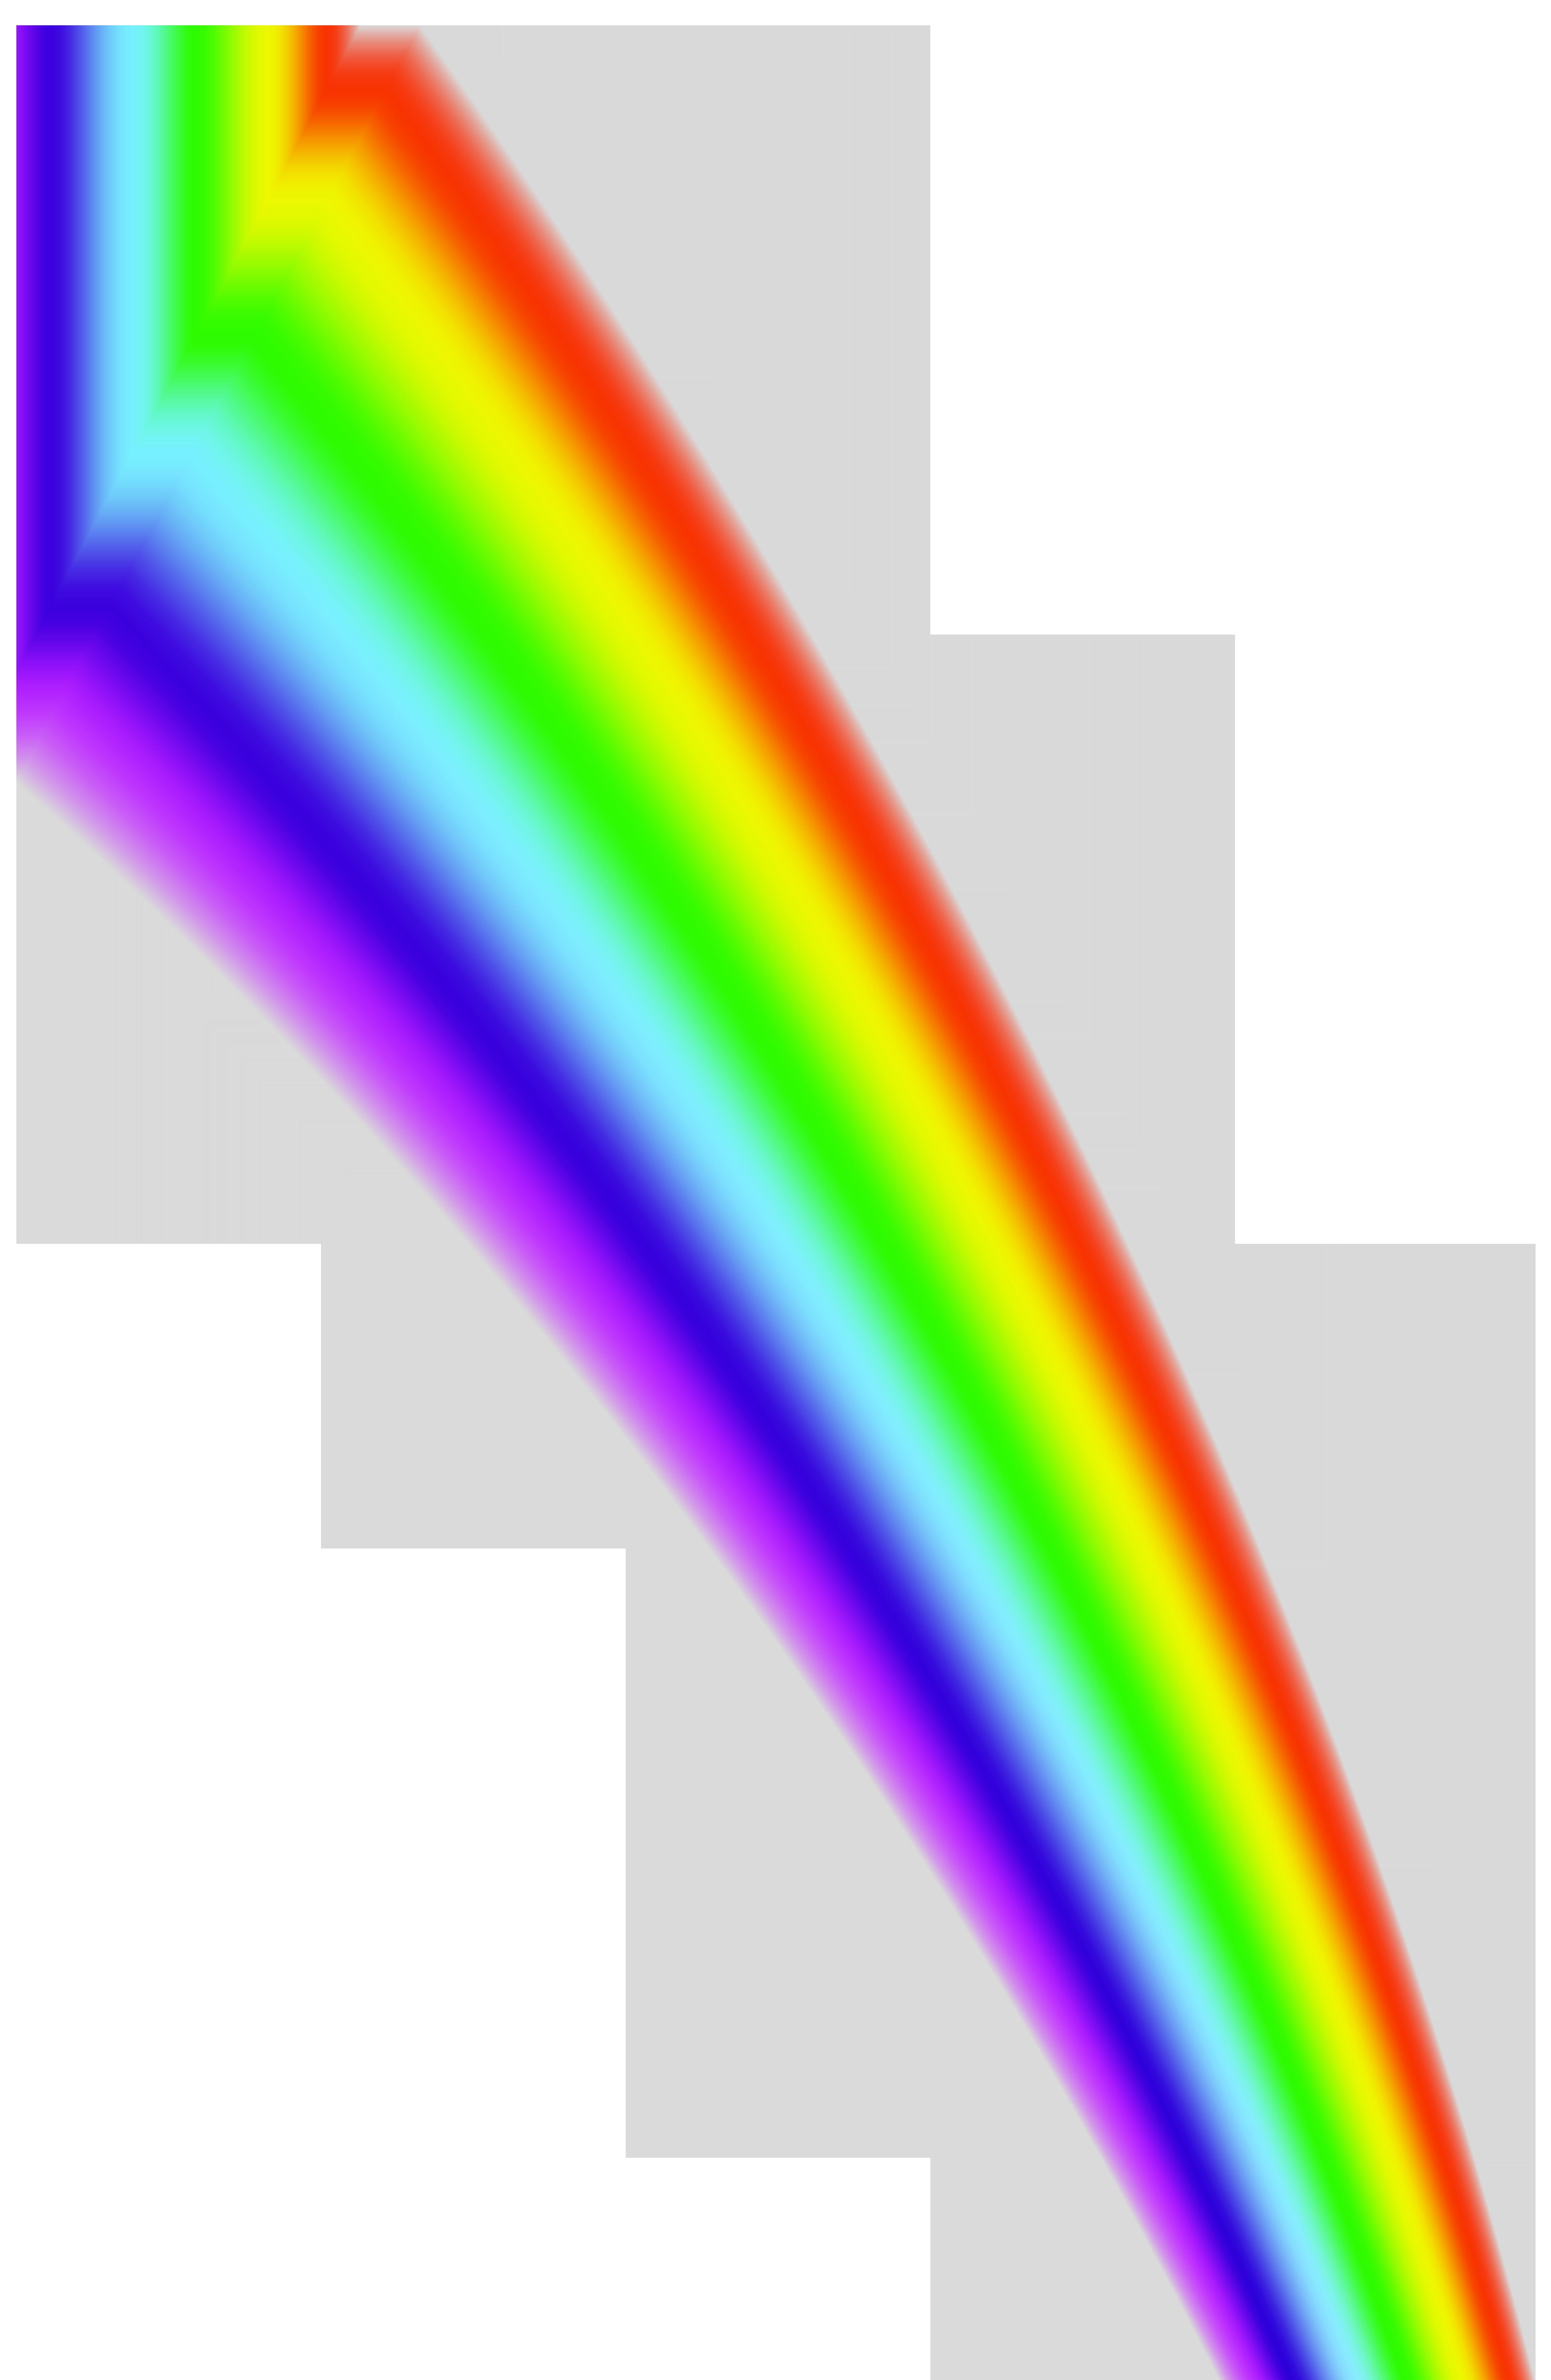 5213x8000 Rainbow Line Transparent Png Clip Art Imageu200b Gallery